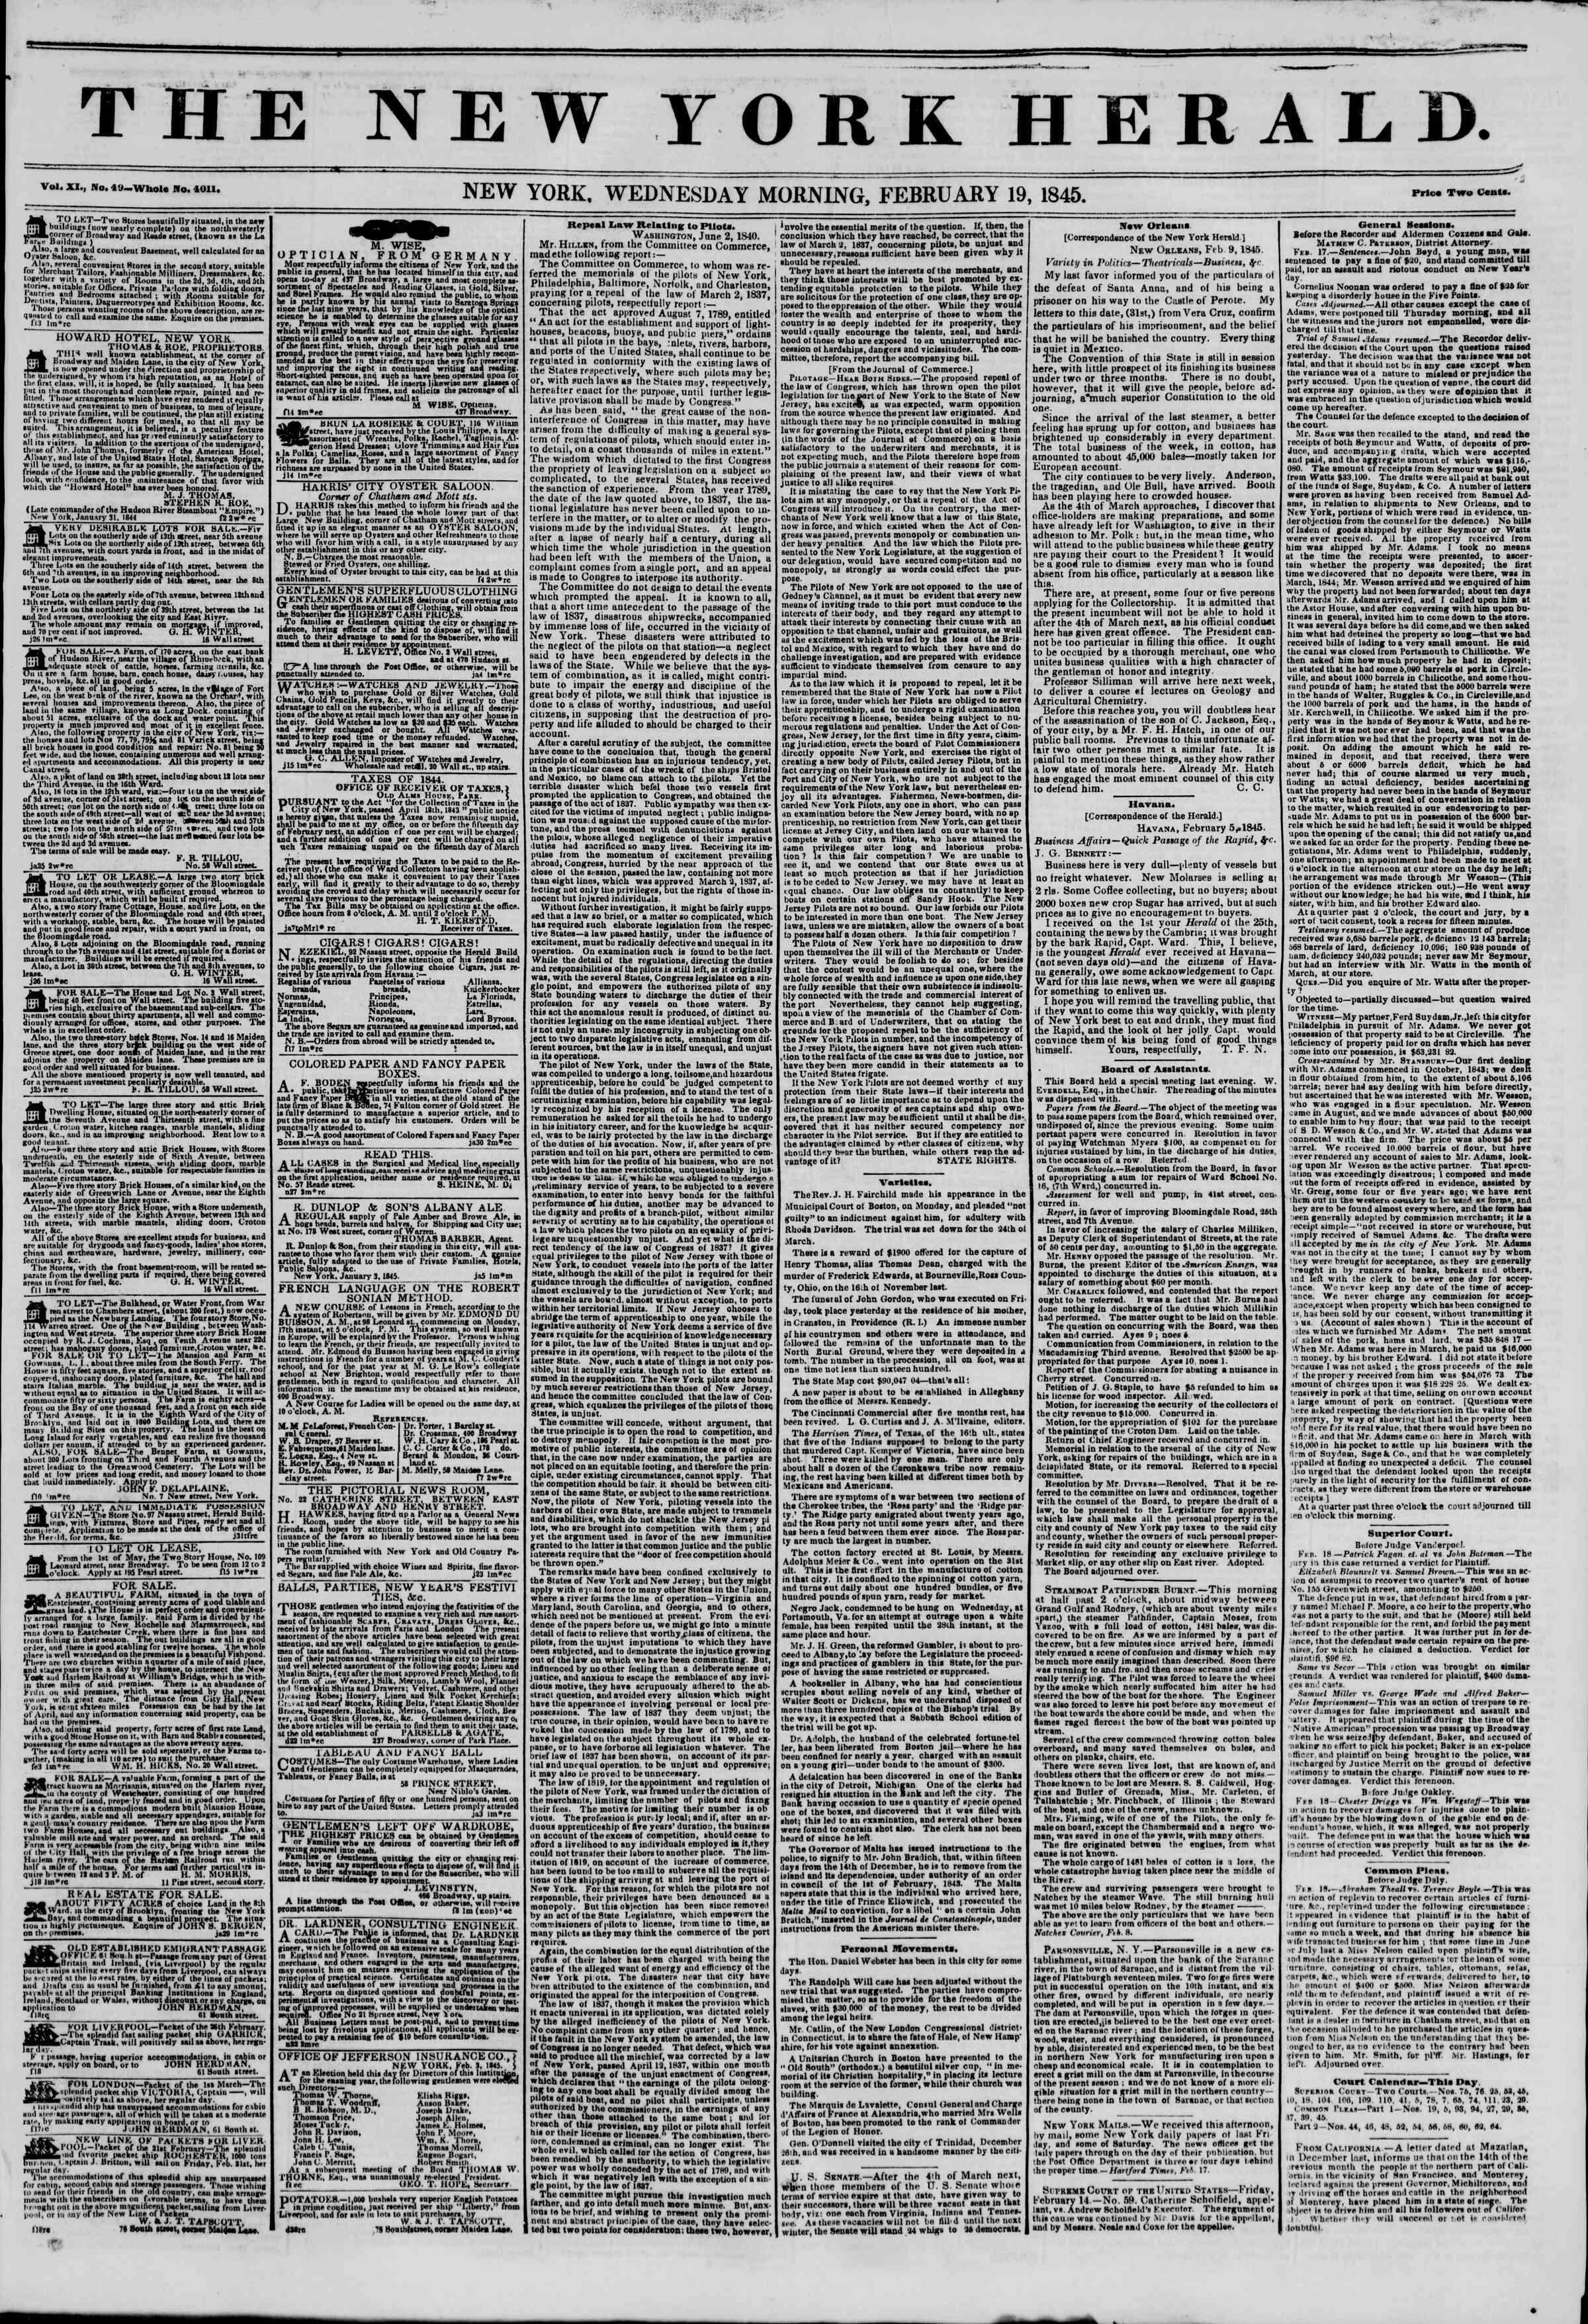 February 19, 1845 Tarihli The New York Herald Gazetesi Sayfa 1